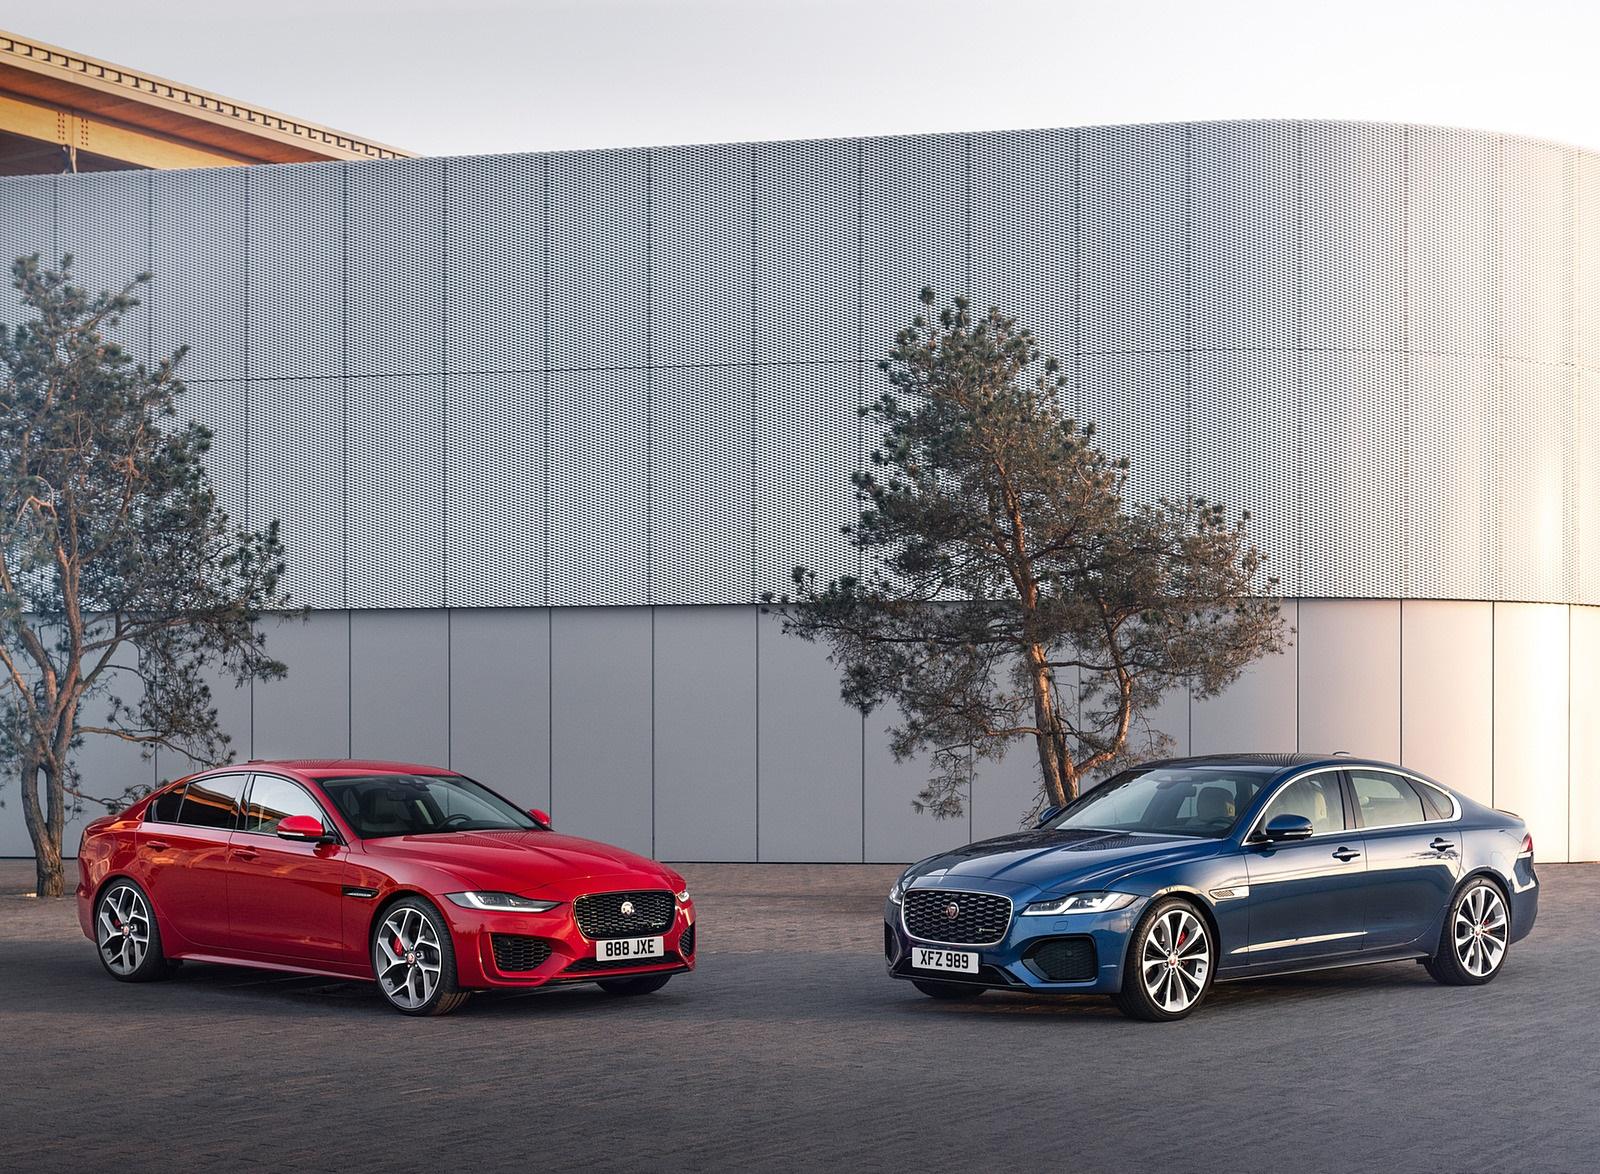 2021 Jaguar XE Wallpapers (8)